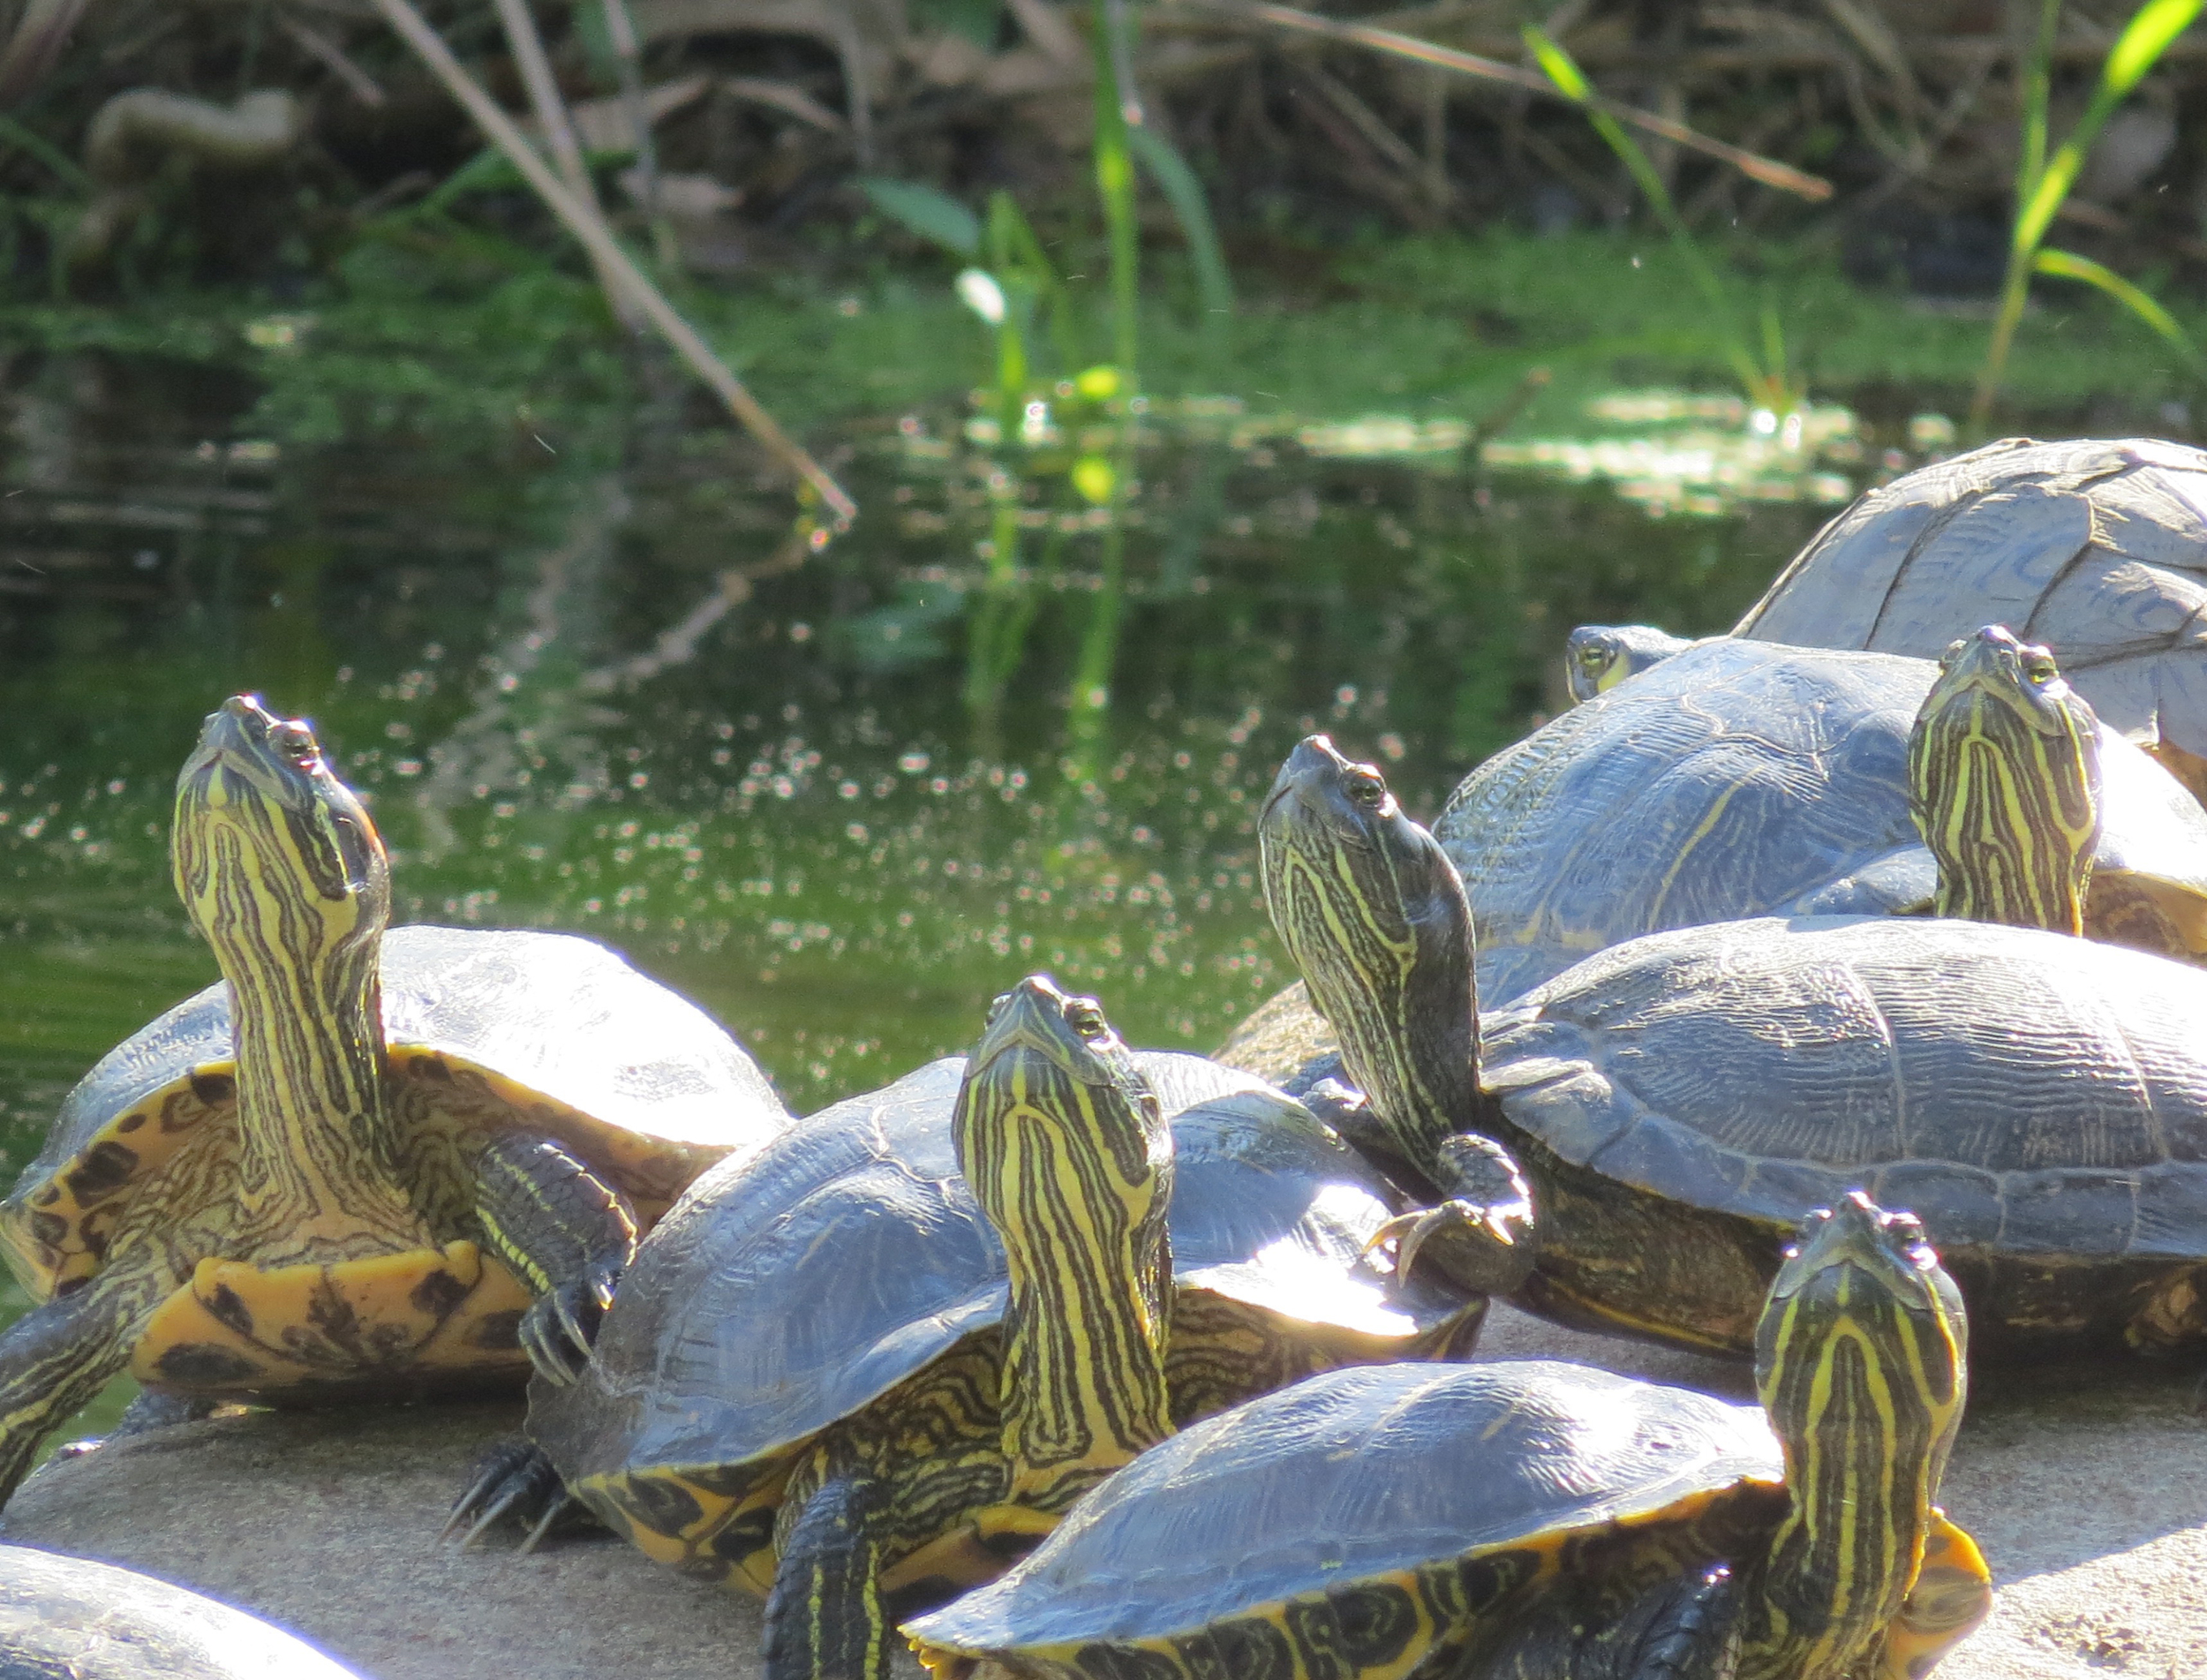 Sunbathing Turtles, Brooklyn, NY